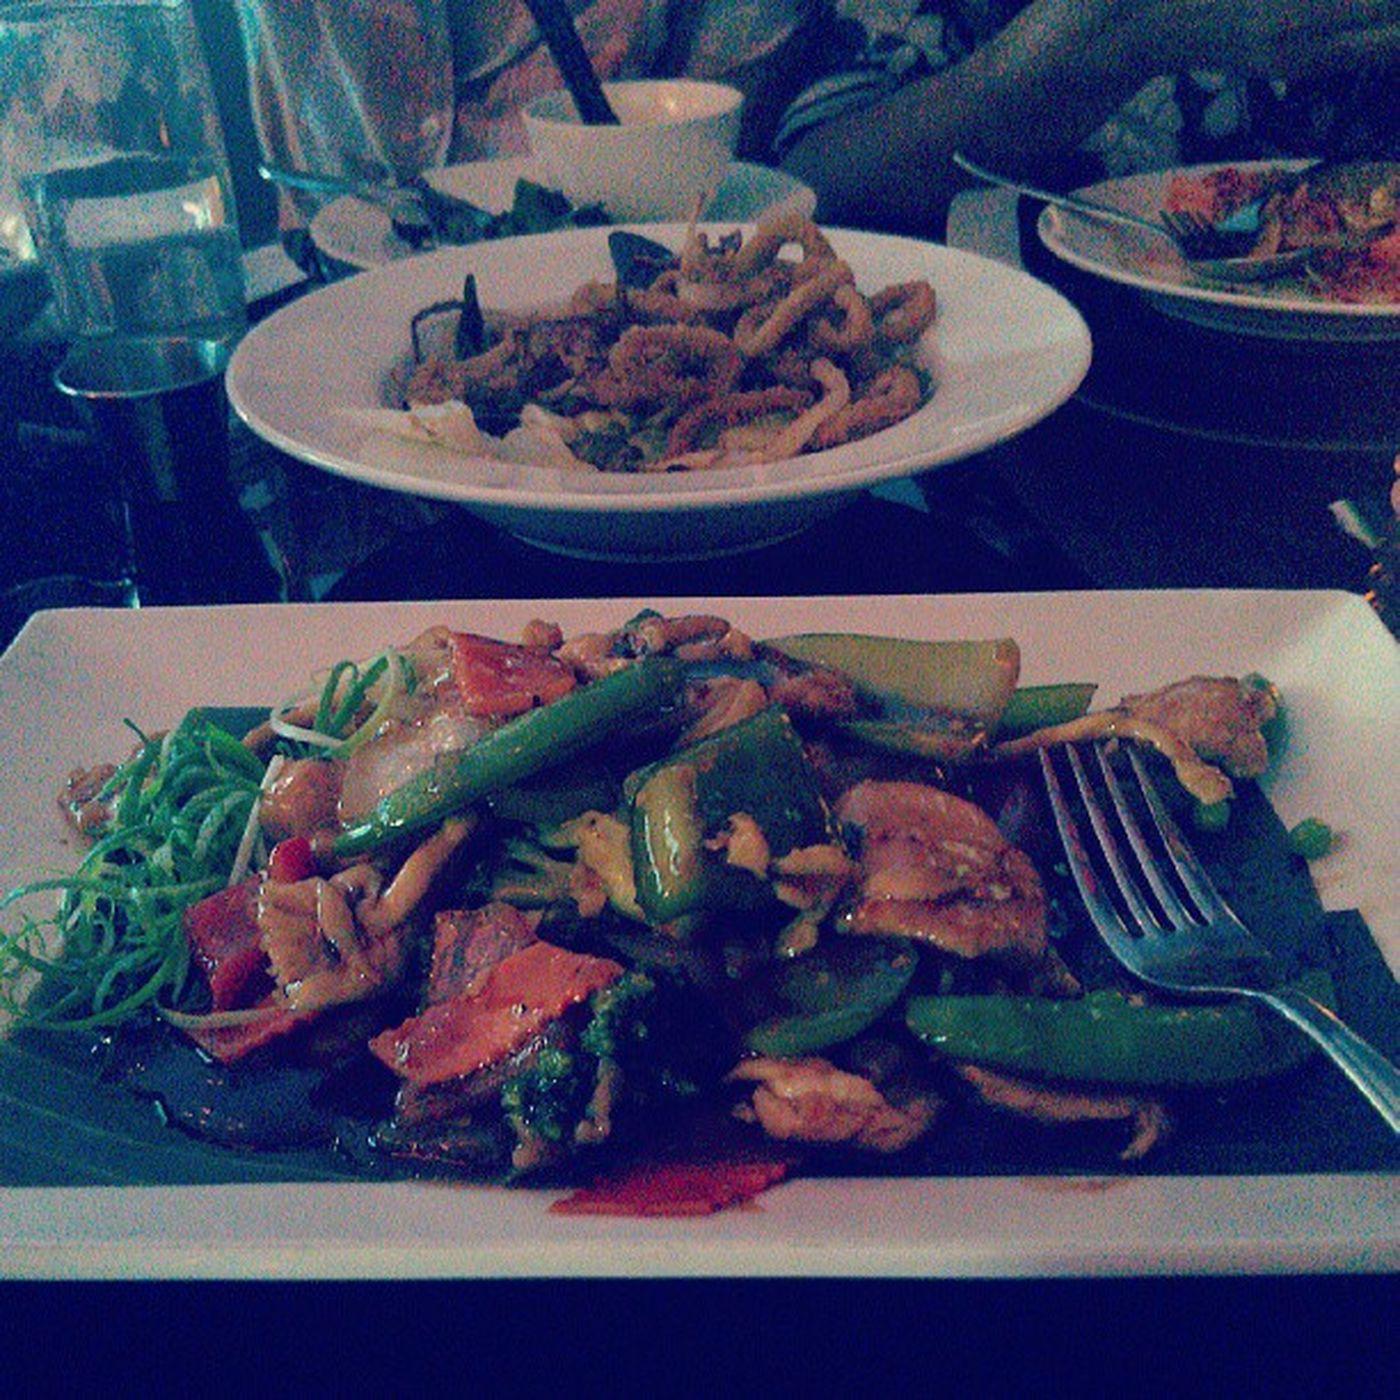 Enjoying Yummy Szechuan chicken, calamari, coconut shrimp and famous pad thai..